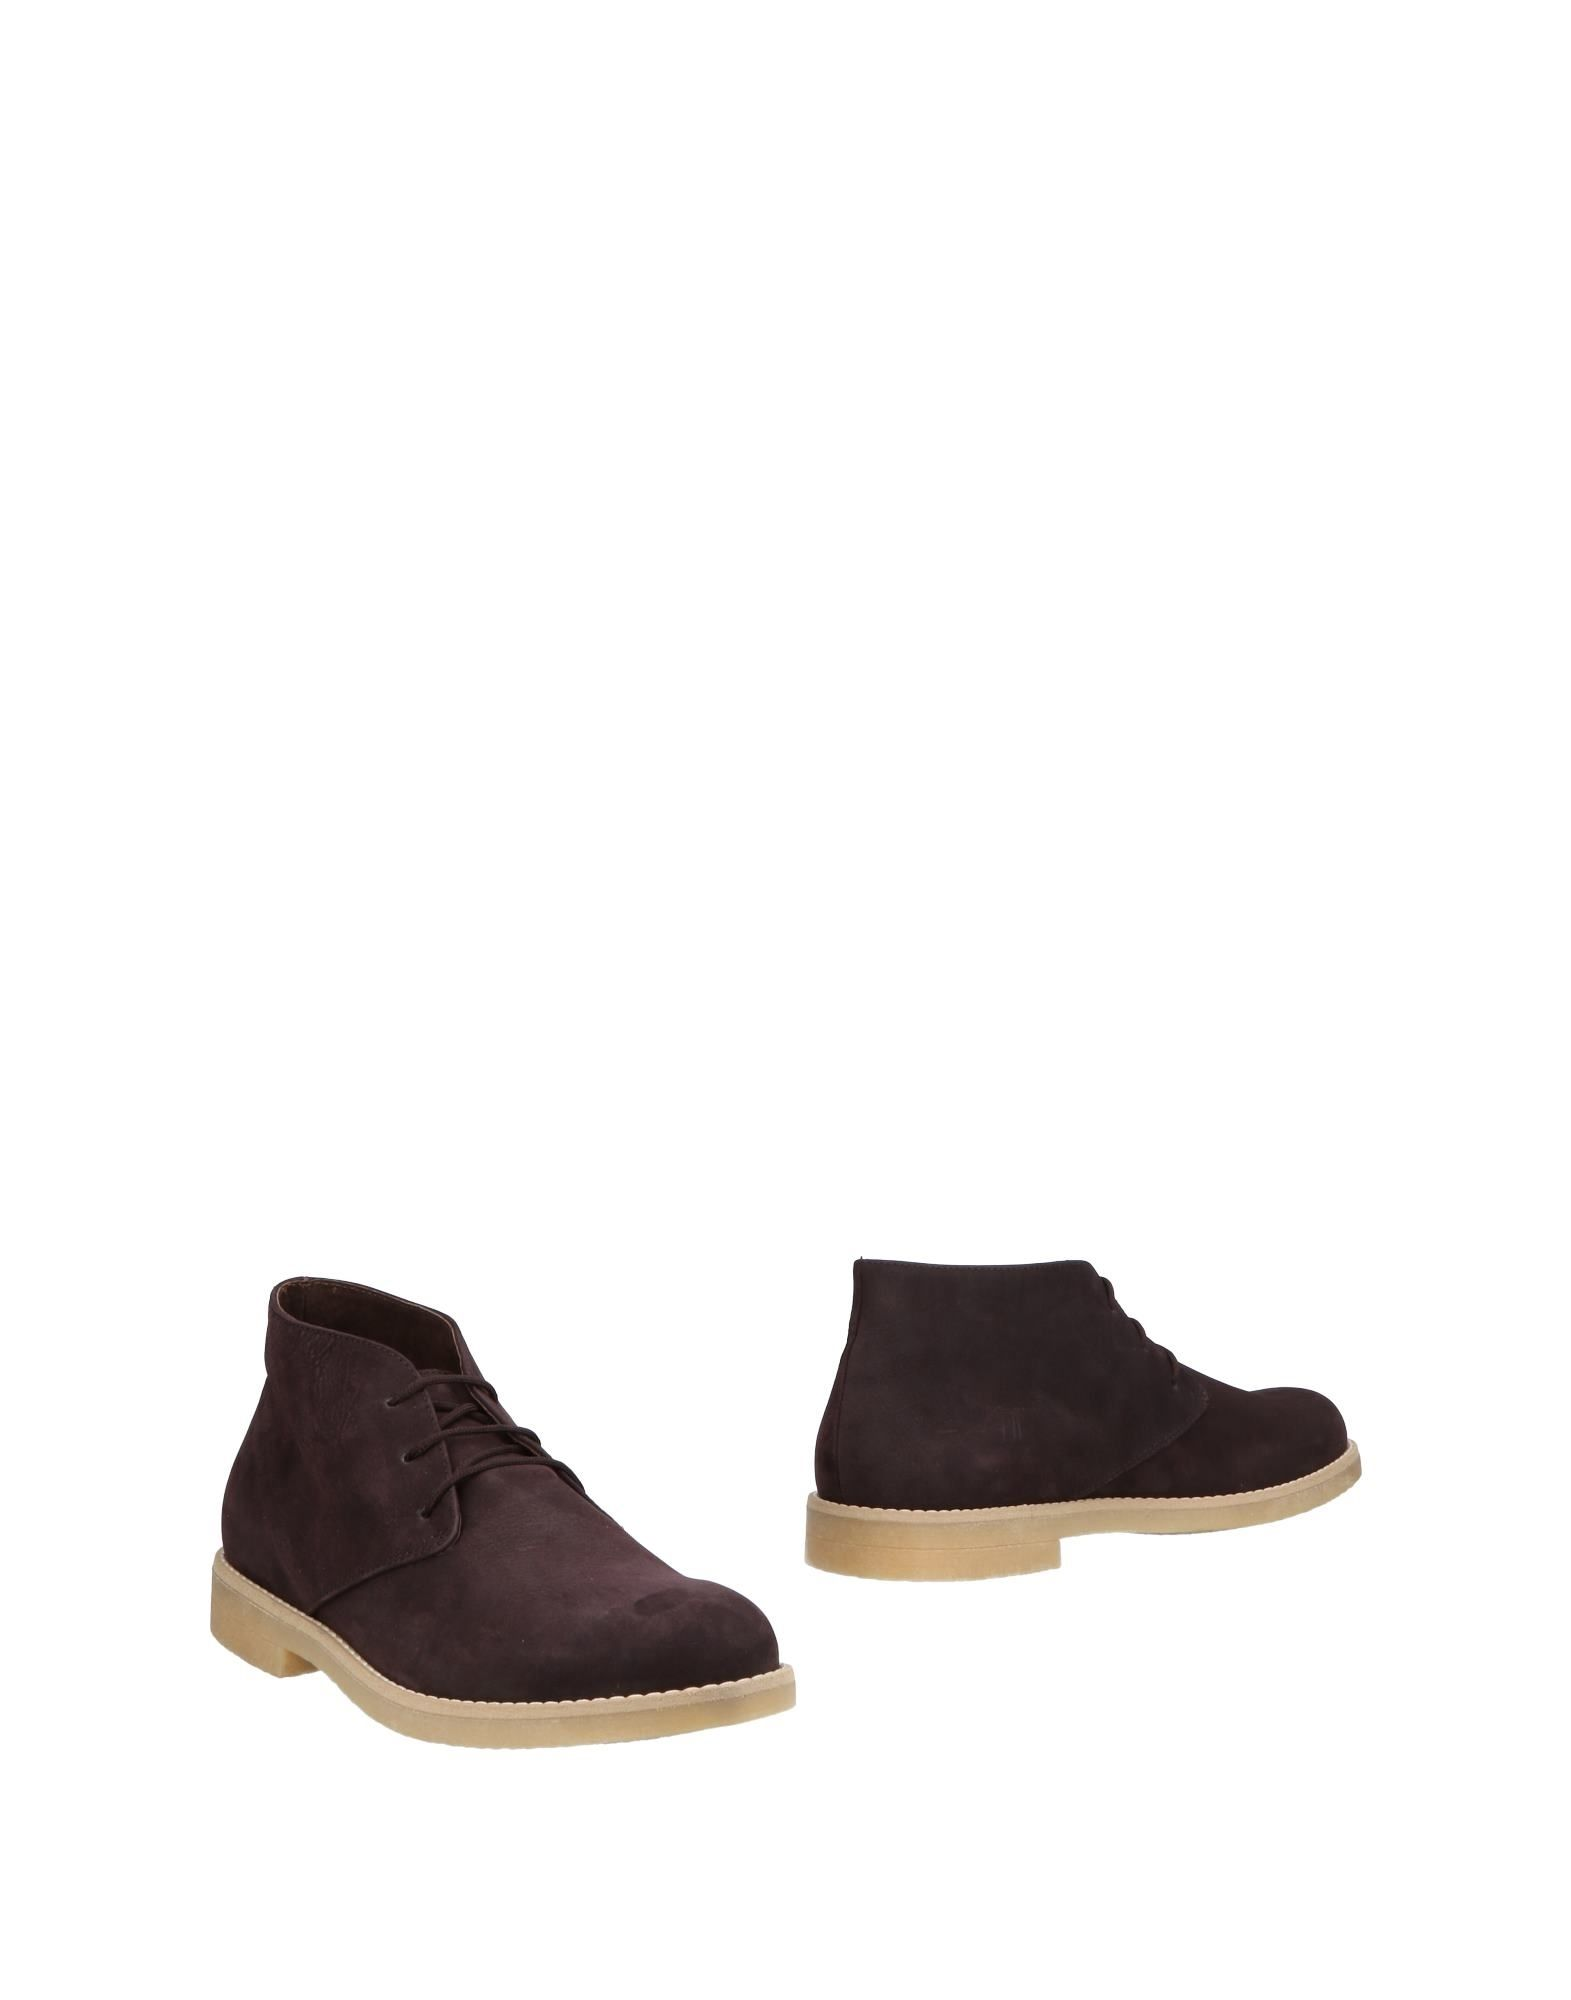 Tsd12 Stiefelette Herren  11504297FG 11504297FG 11504297FG Gute Qualität beliebte Schuhe 0b0cb3